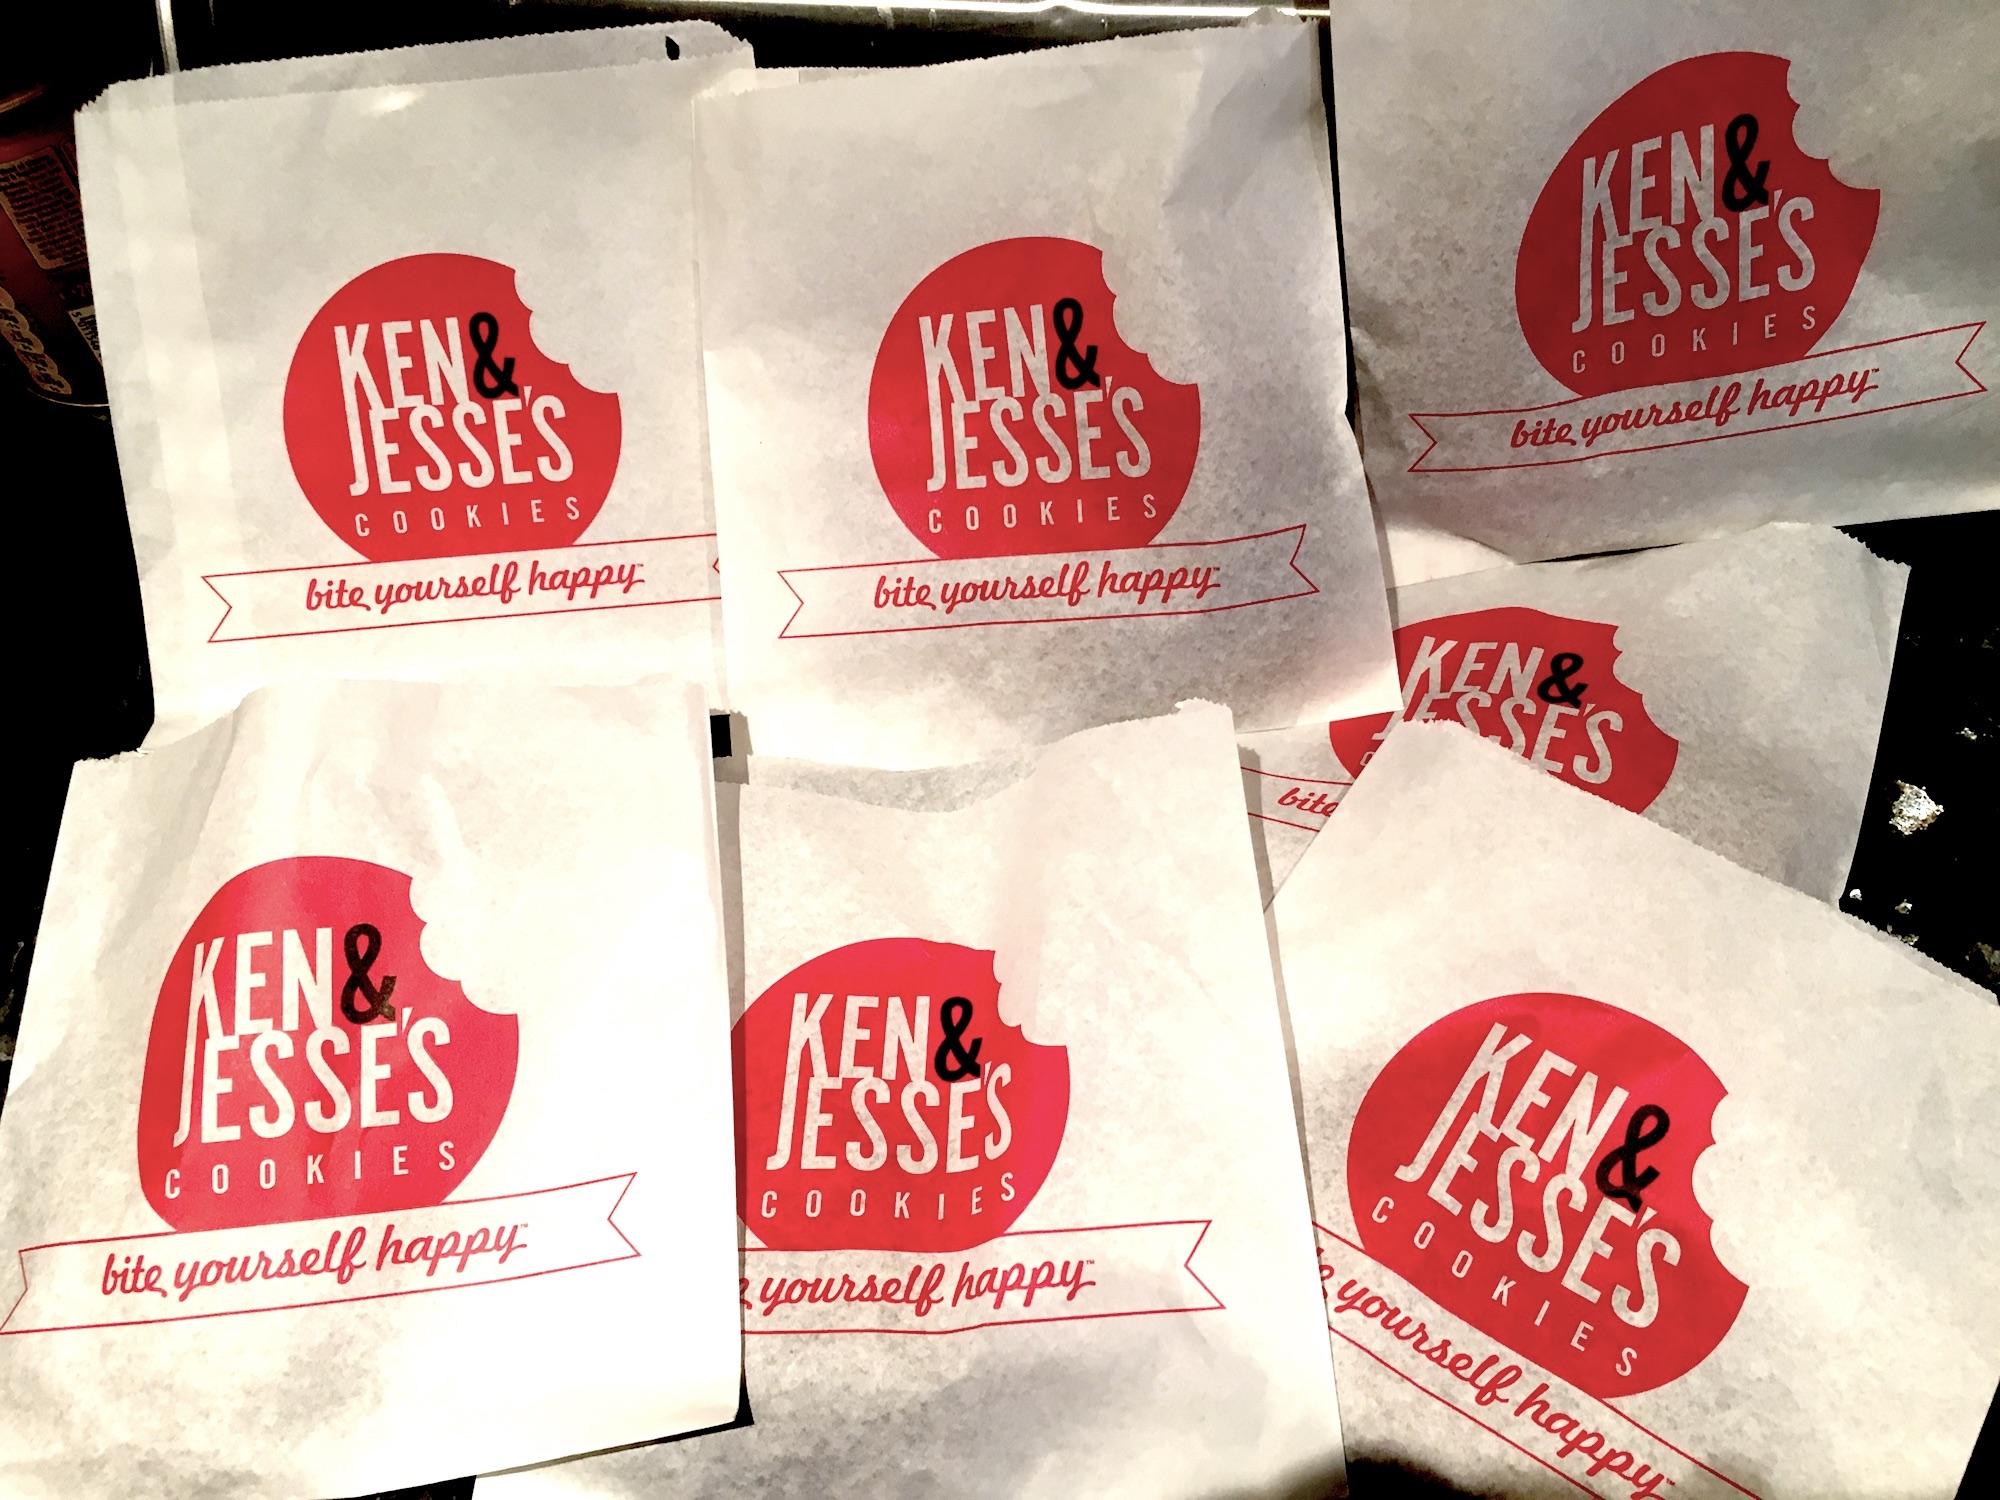 Ken and Jesse's cookies paper bags